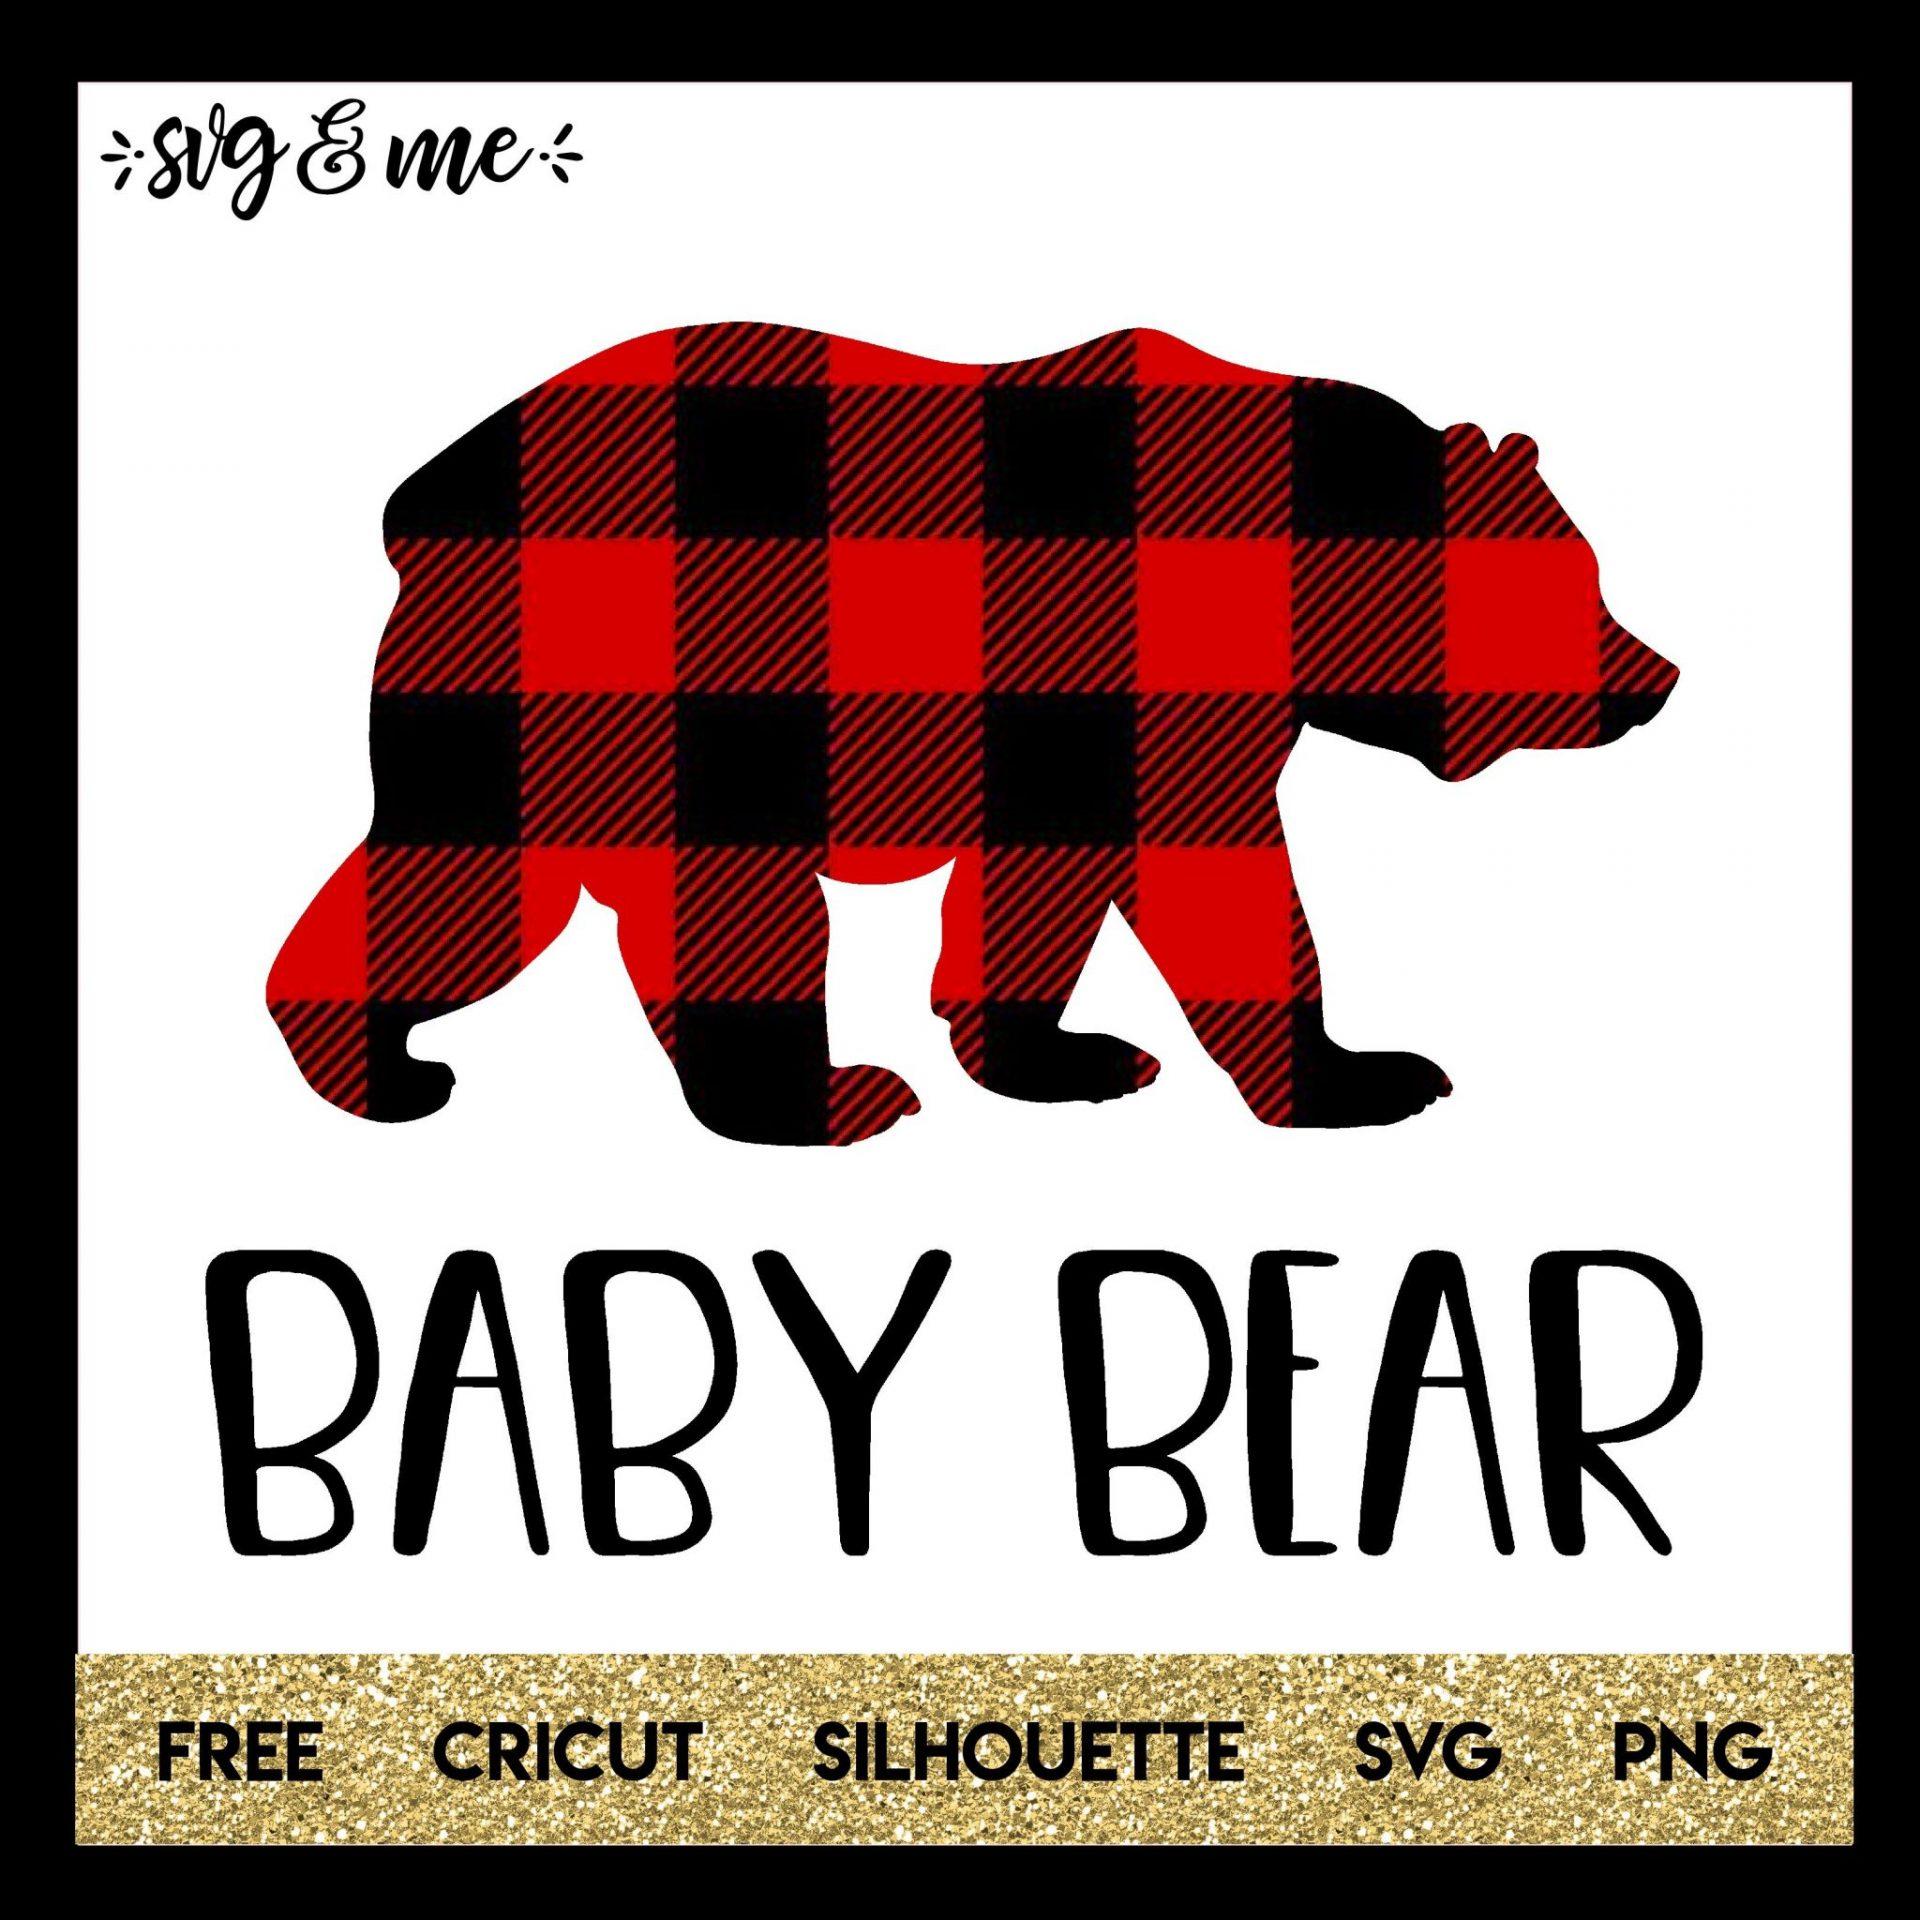 Svg \u2022 Png \u2022 Eps \u2022 Dxf \u2022 Jpg \u2022 Download Silhouette etc For Cricut 4 Baby Bear SVG Designs DONATES to ANIMALS Print and Cut File